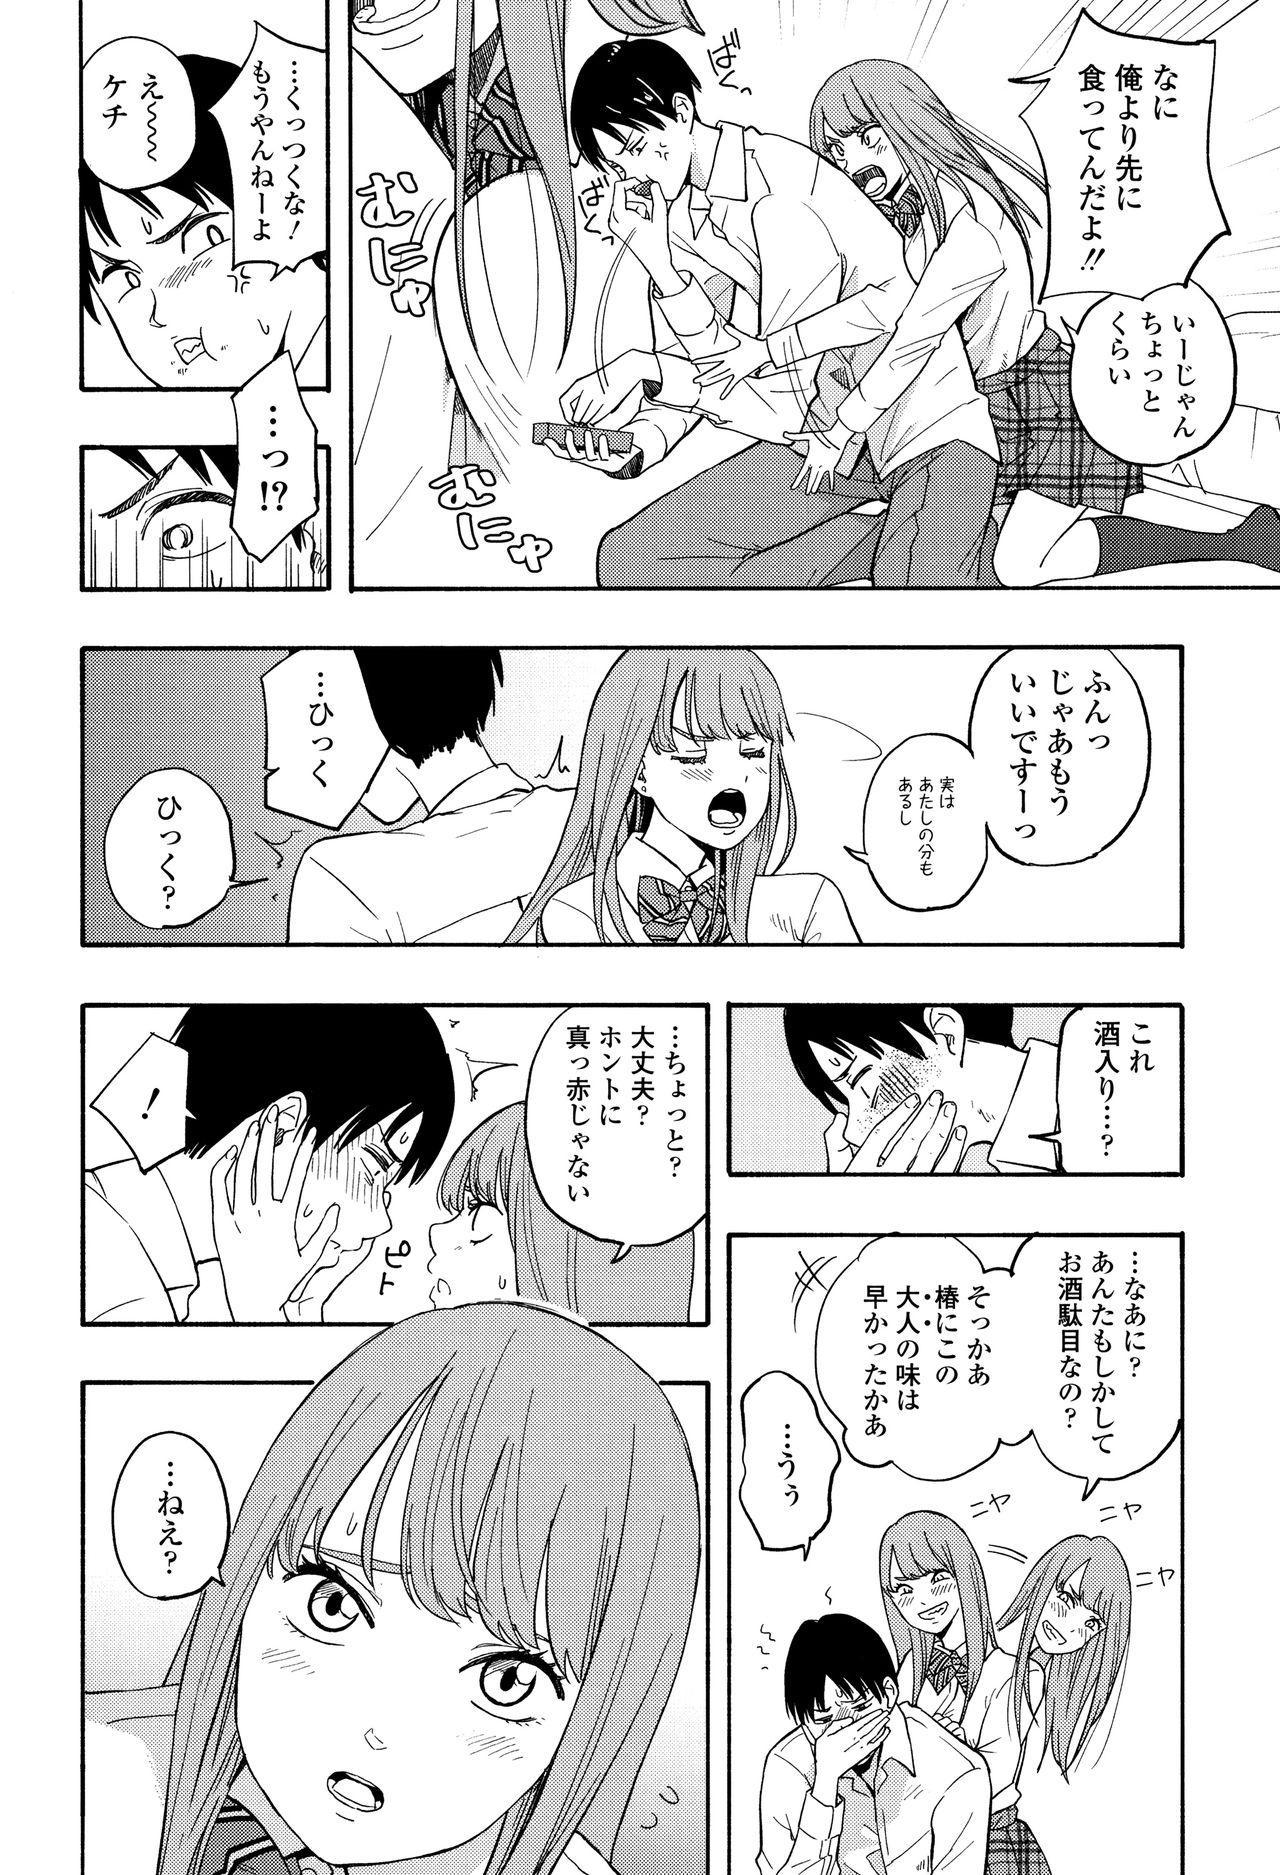 Shishunki no Eros - puberty eros 104